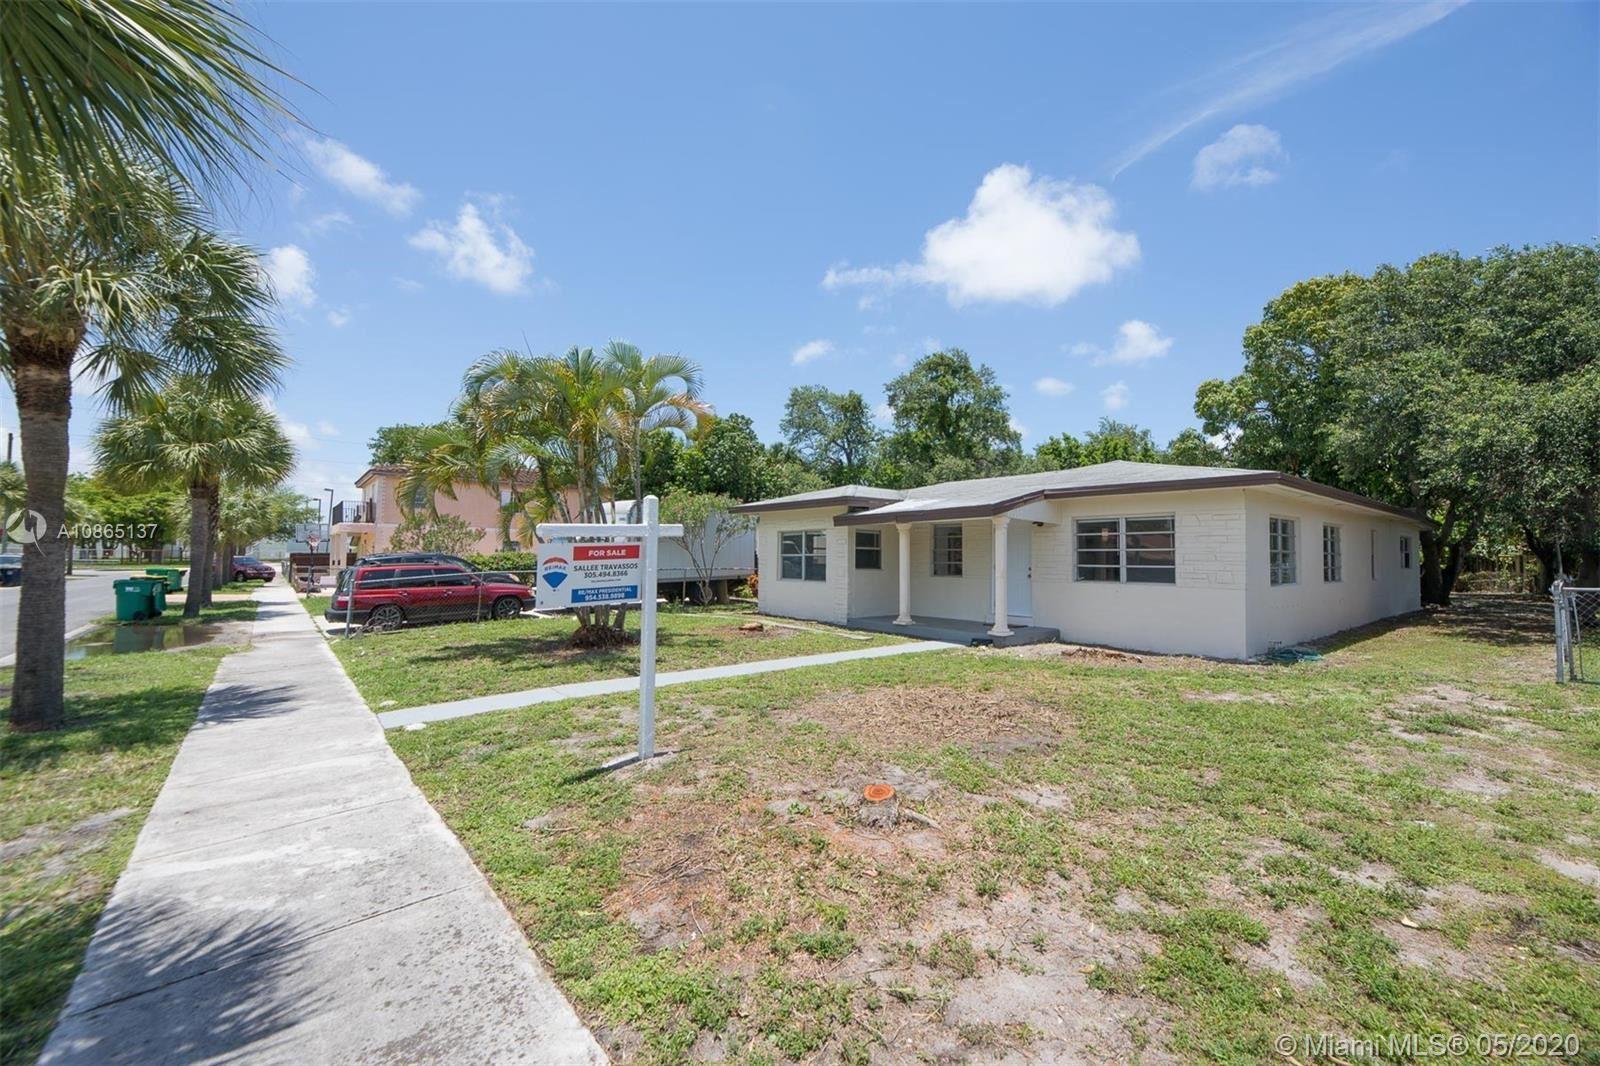 Photo of 734 SW 4th Ter, Dania Beach, FL 33004 (MLS # A10865137)